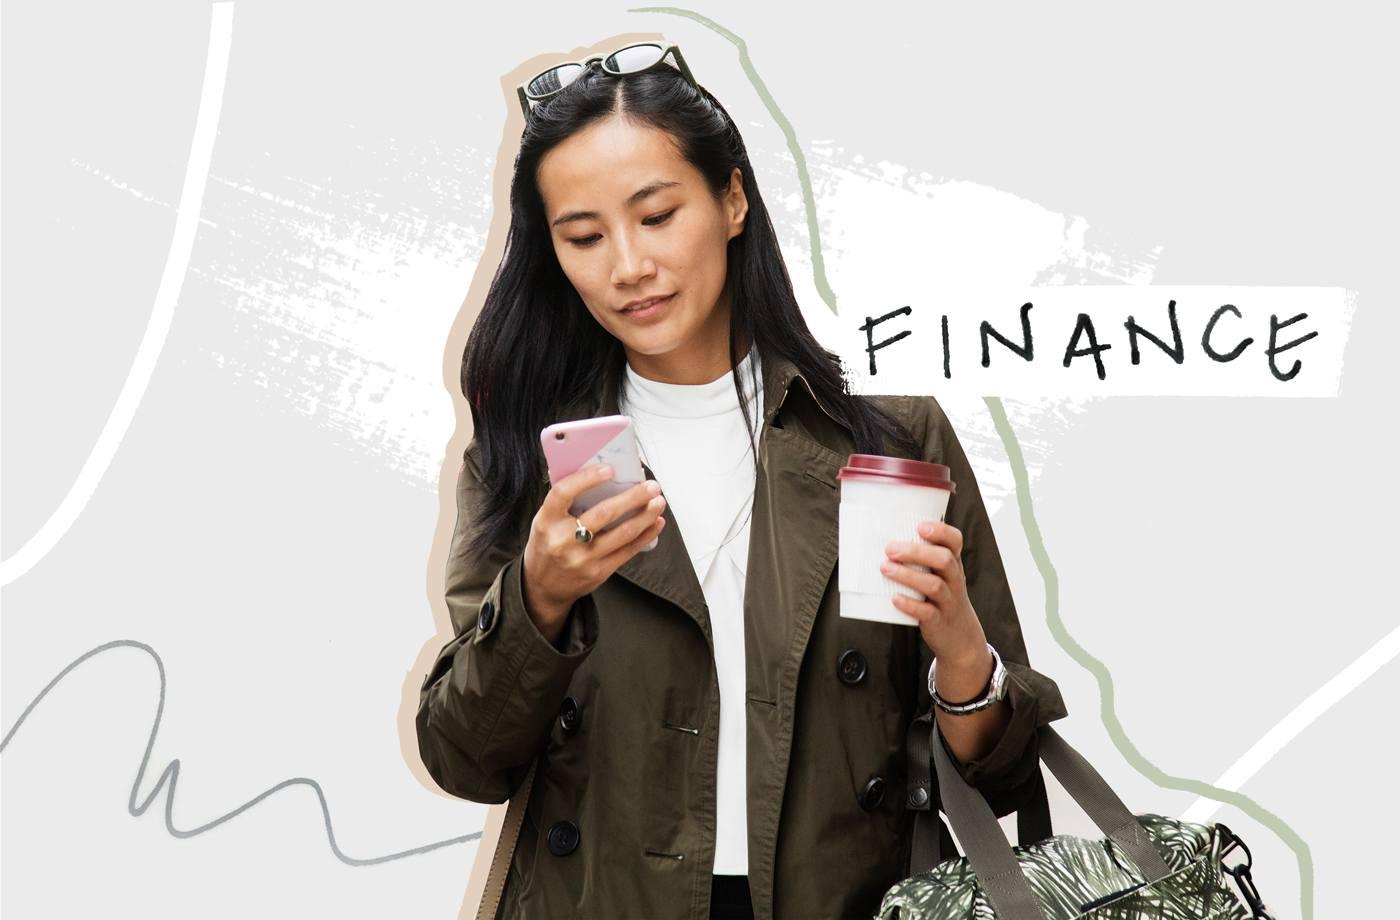 Farnoosh Torabi will help you check in on your finances